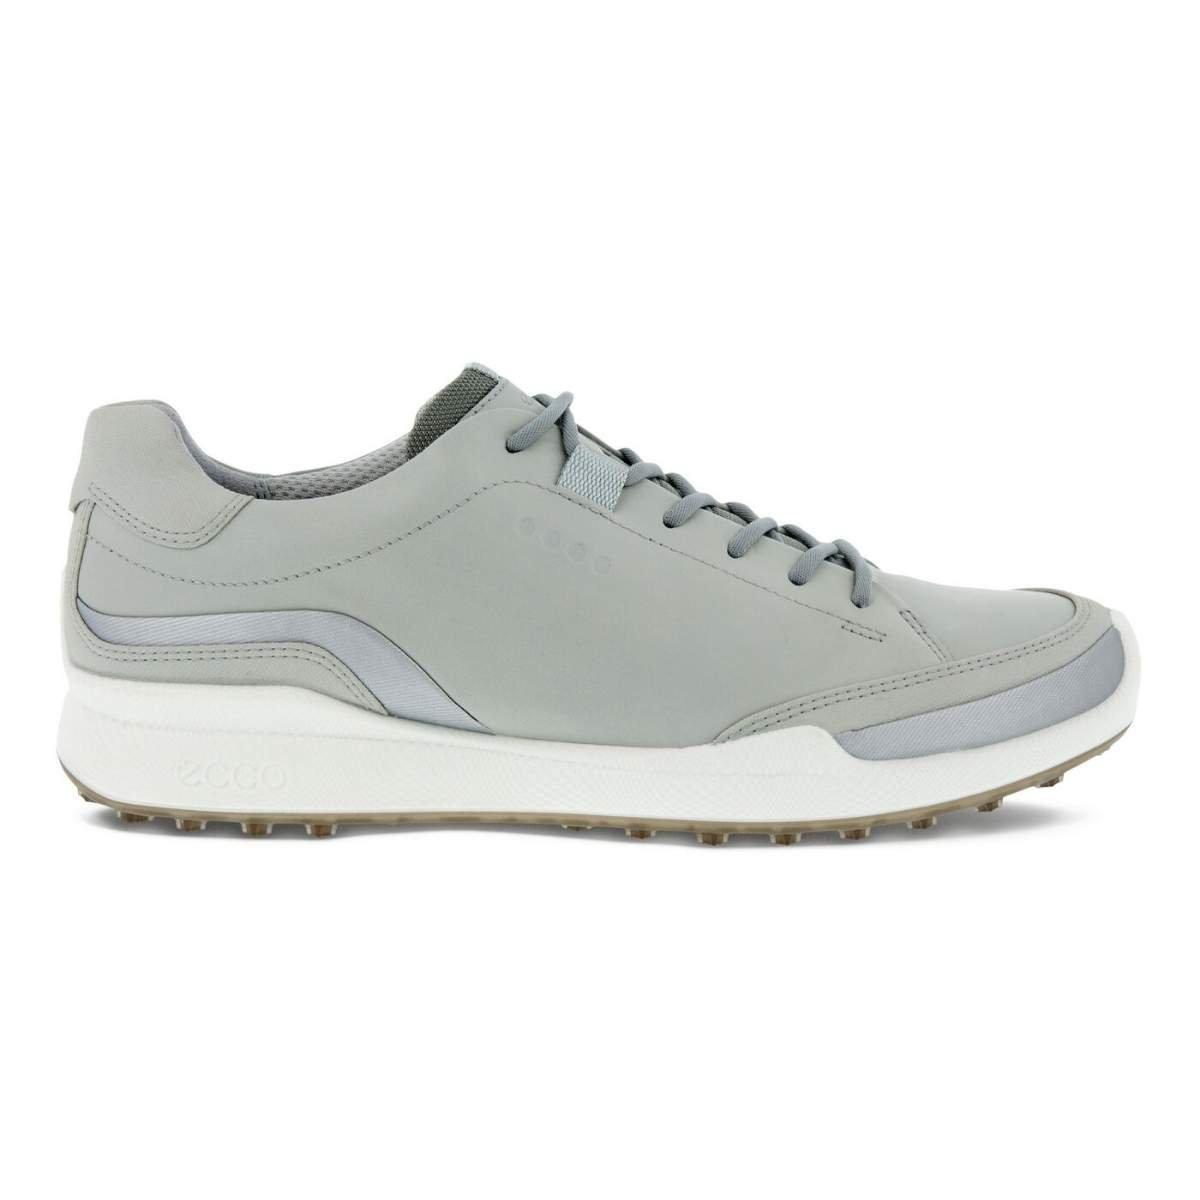 ECCO Men's Biom Hybrid Laced Golf Shoe